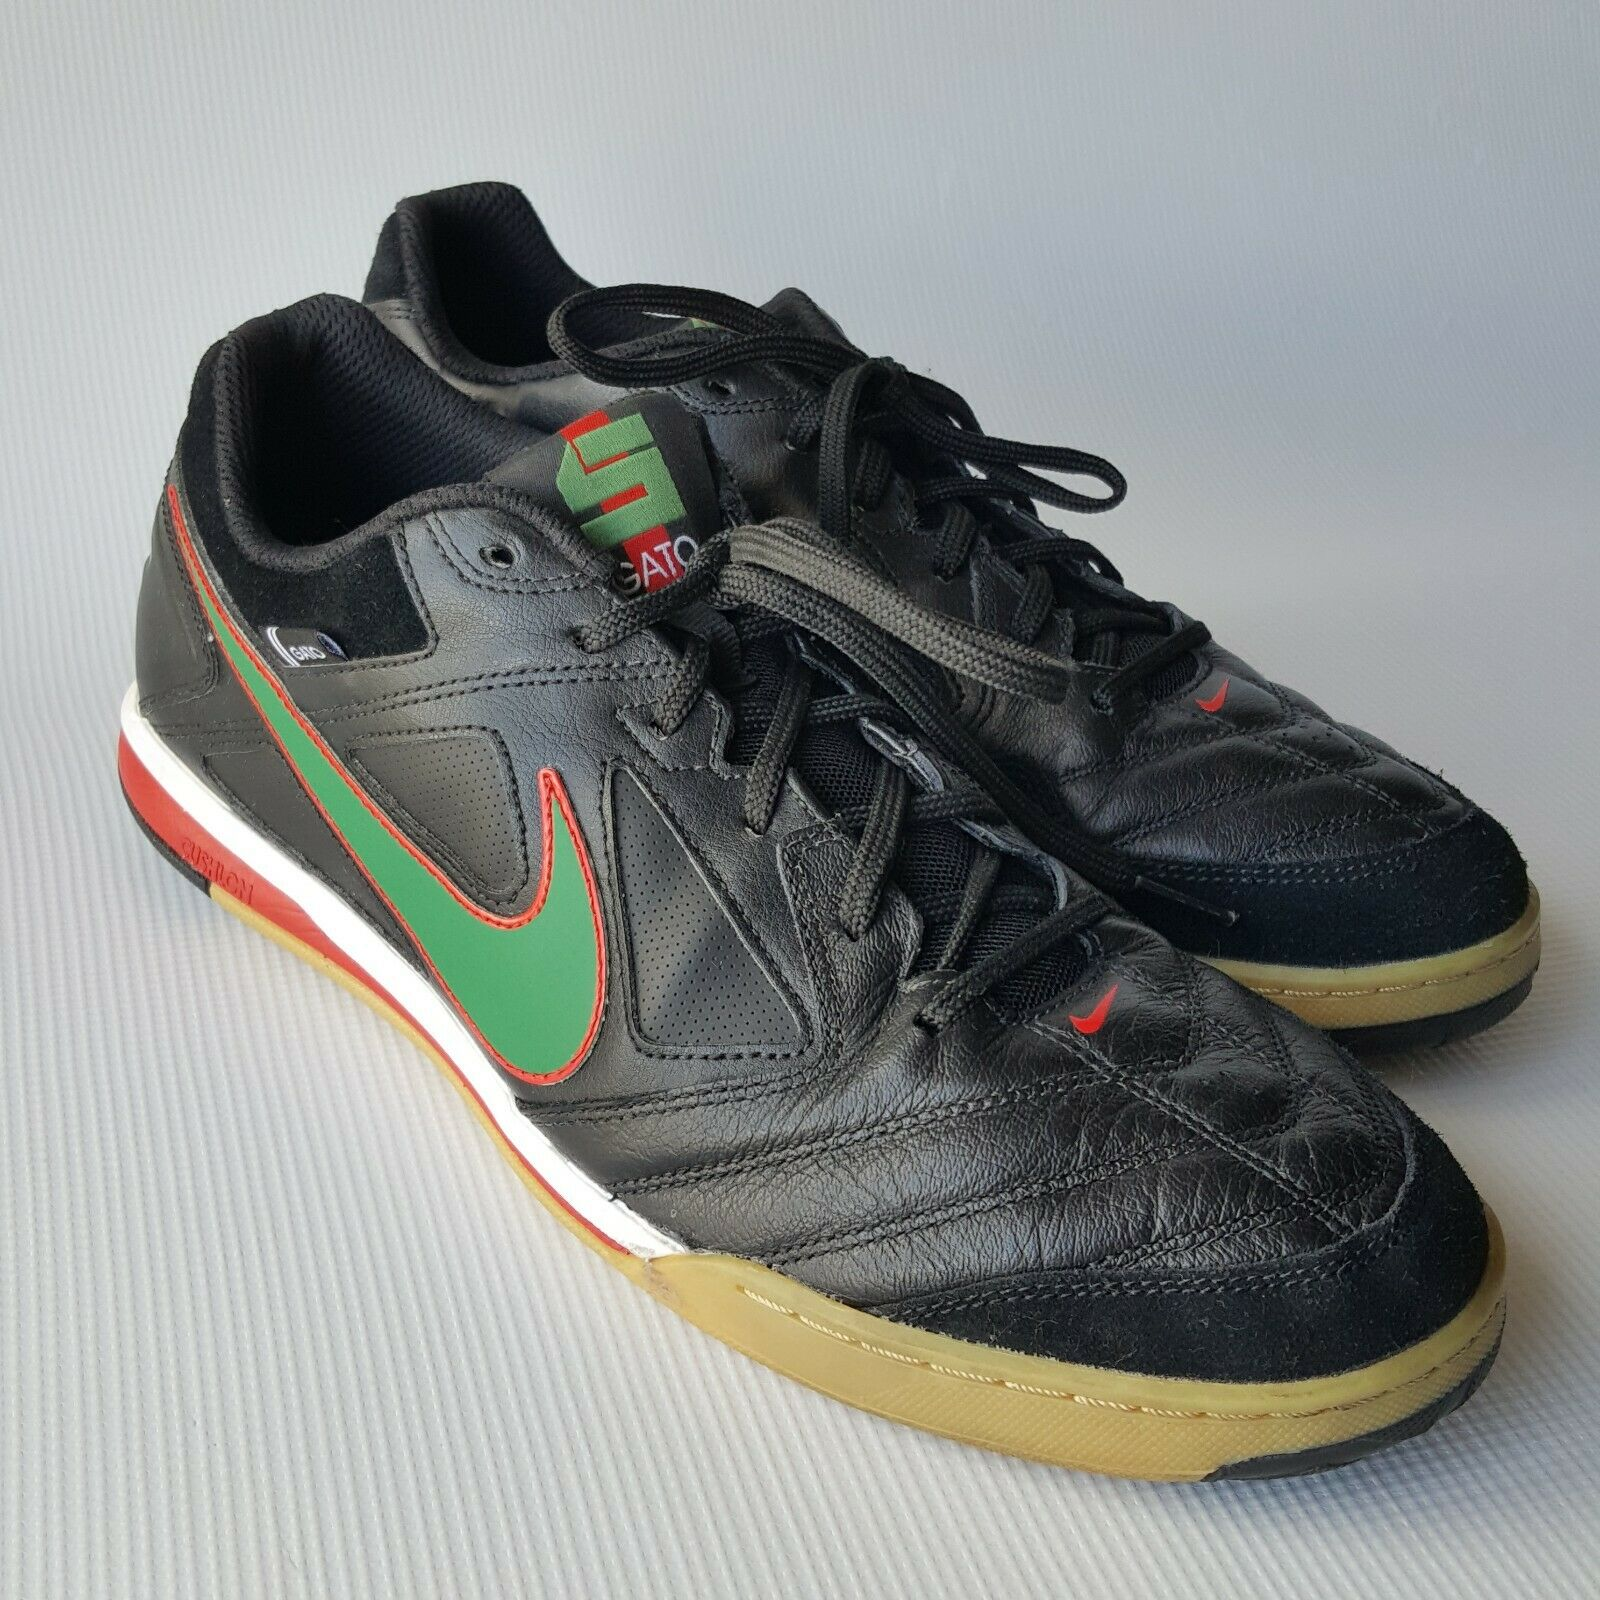 Nike 5 Men's Gato 415123-030 Indoor Soccer shoes Black Green  Red  Swoosh Sz.13